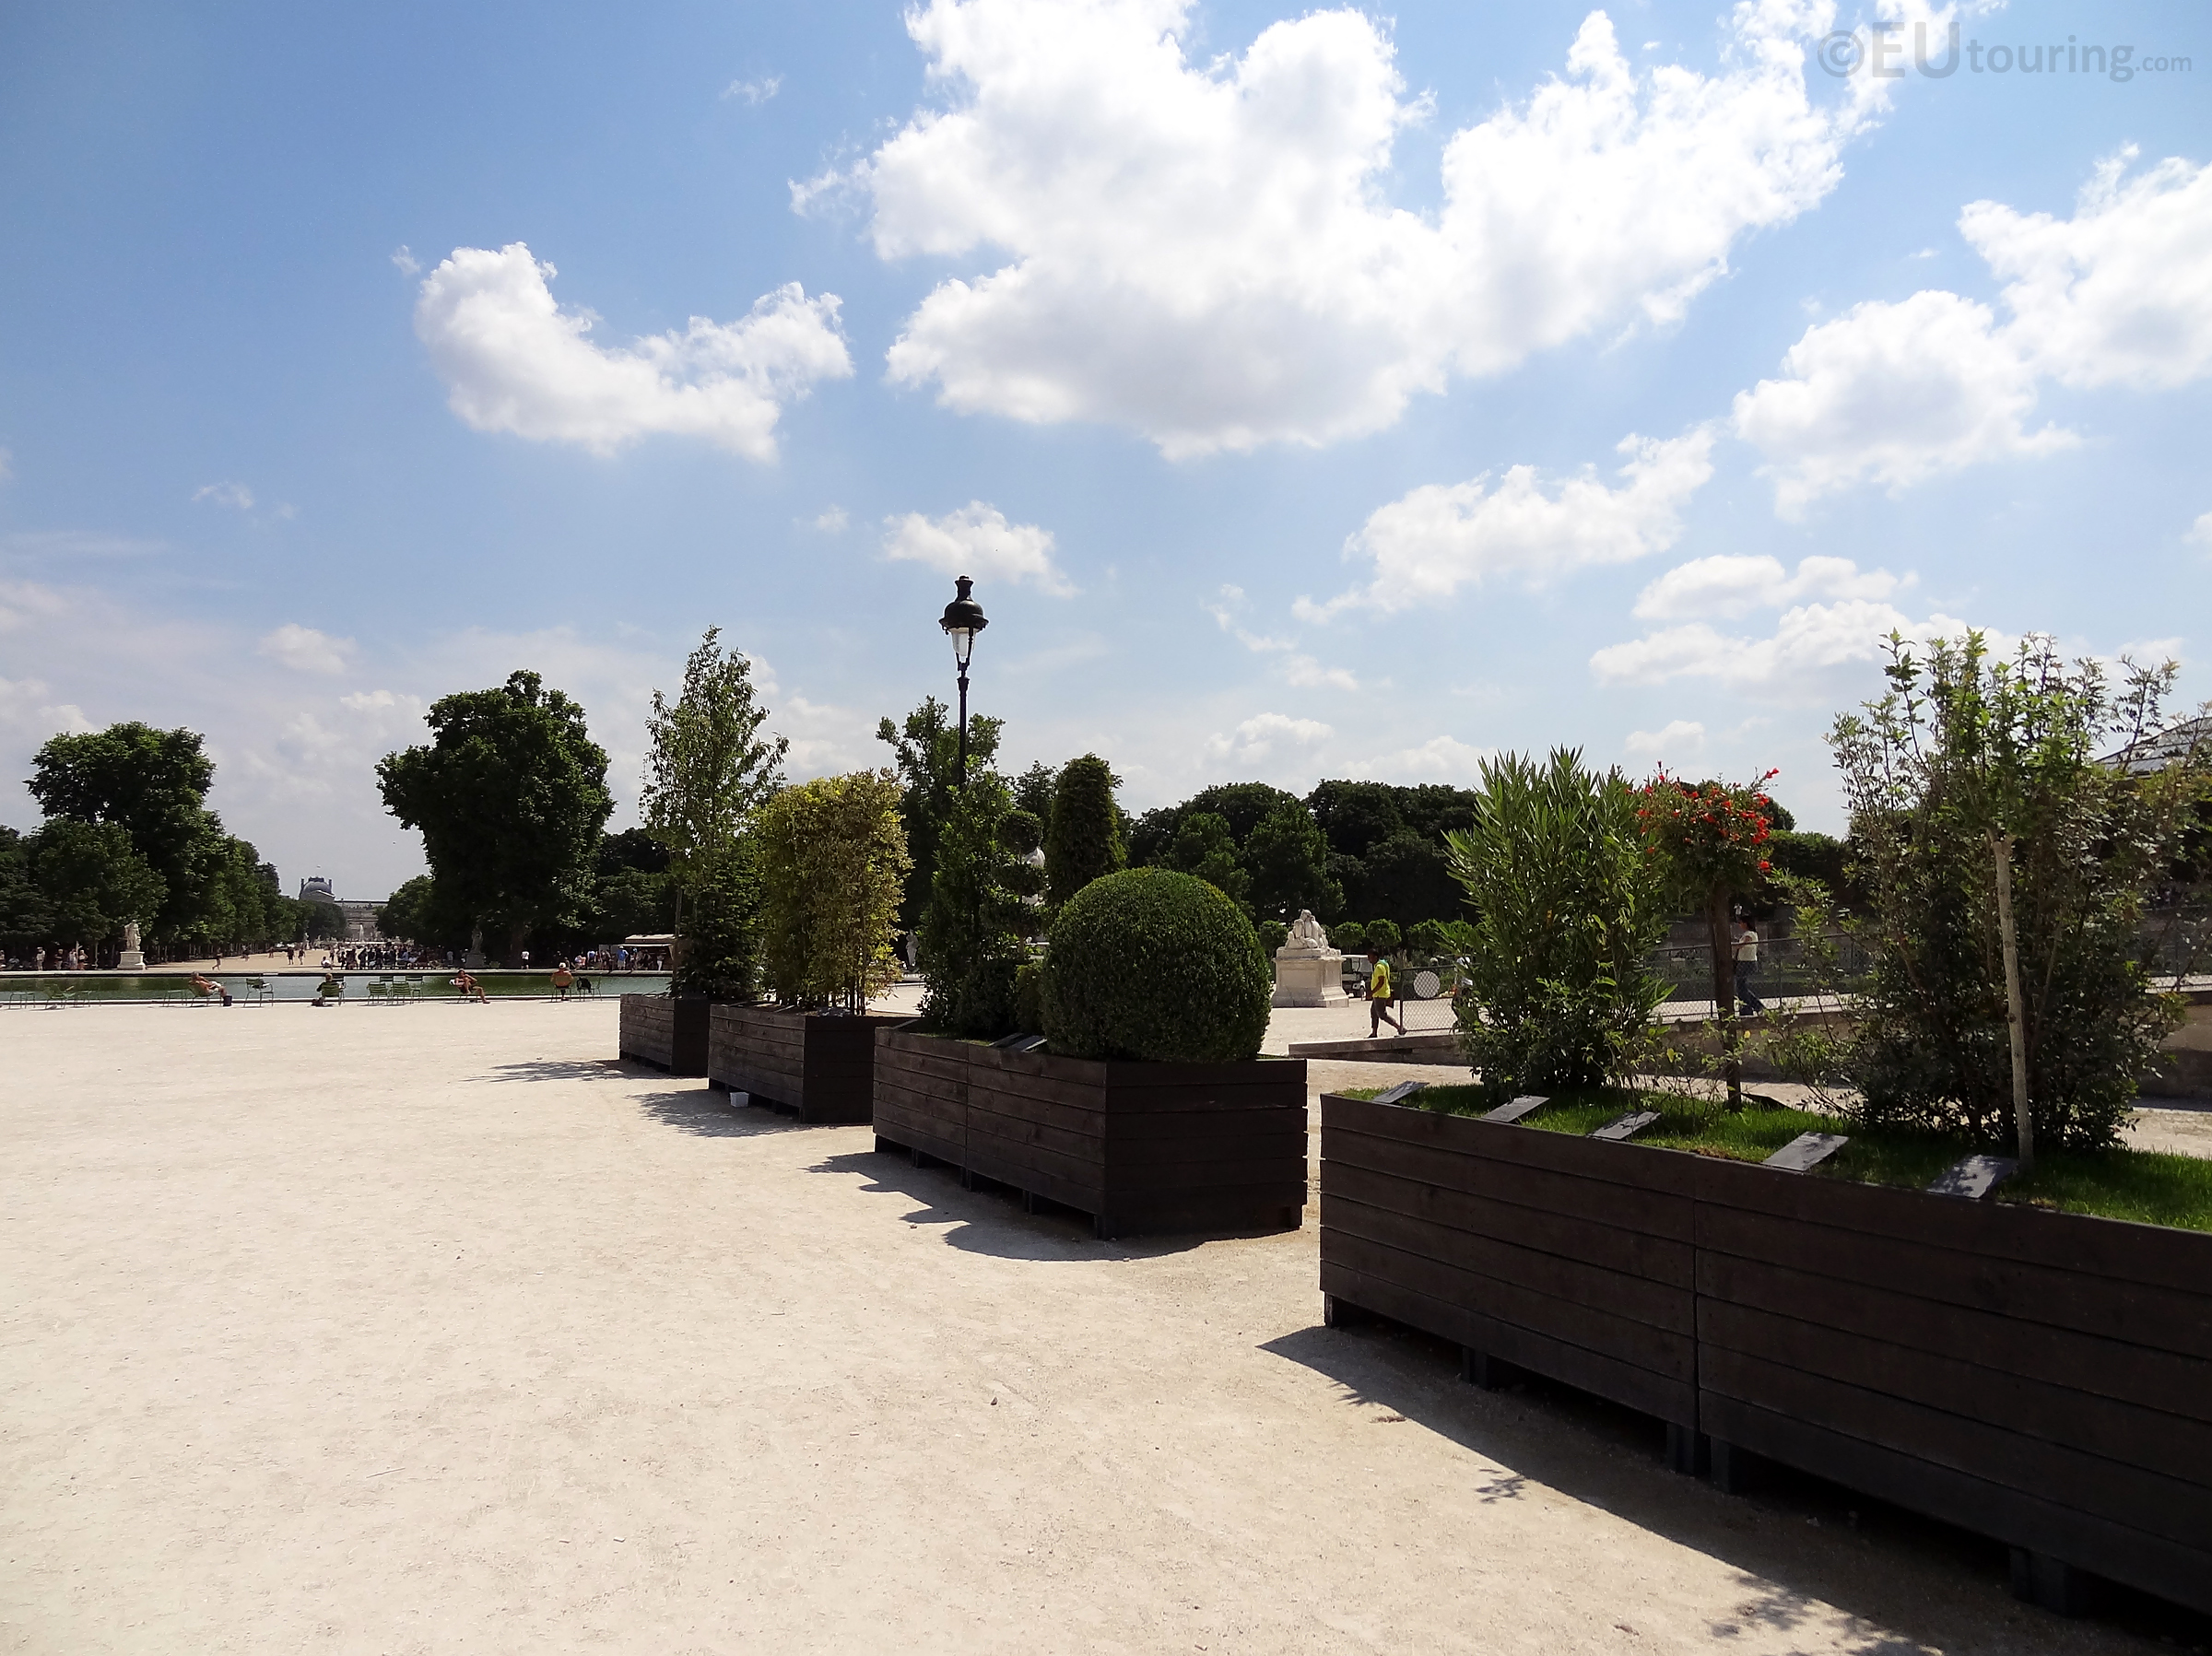 Walkway through the Tuileries